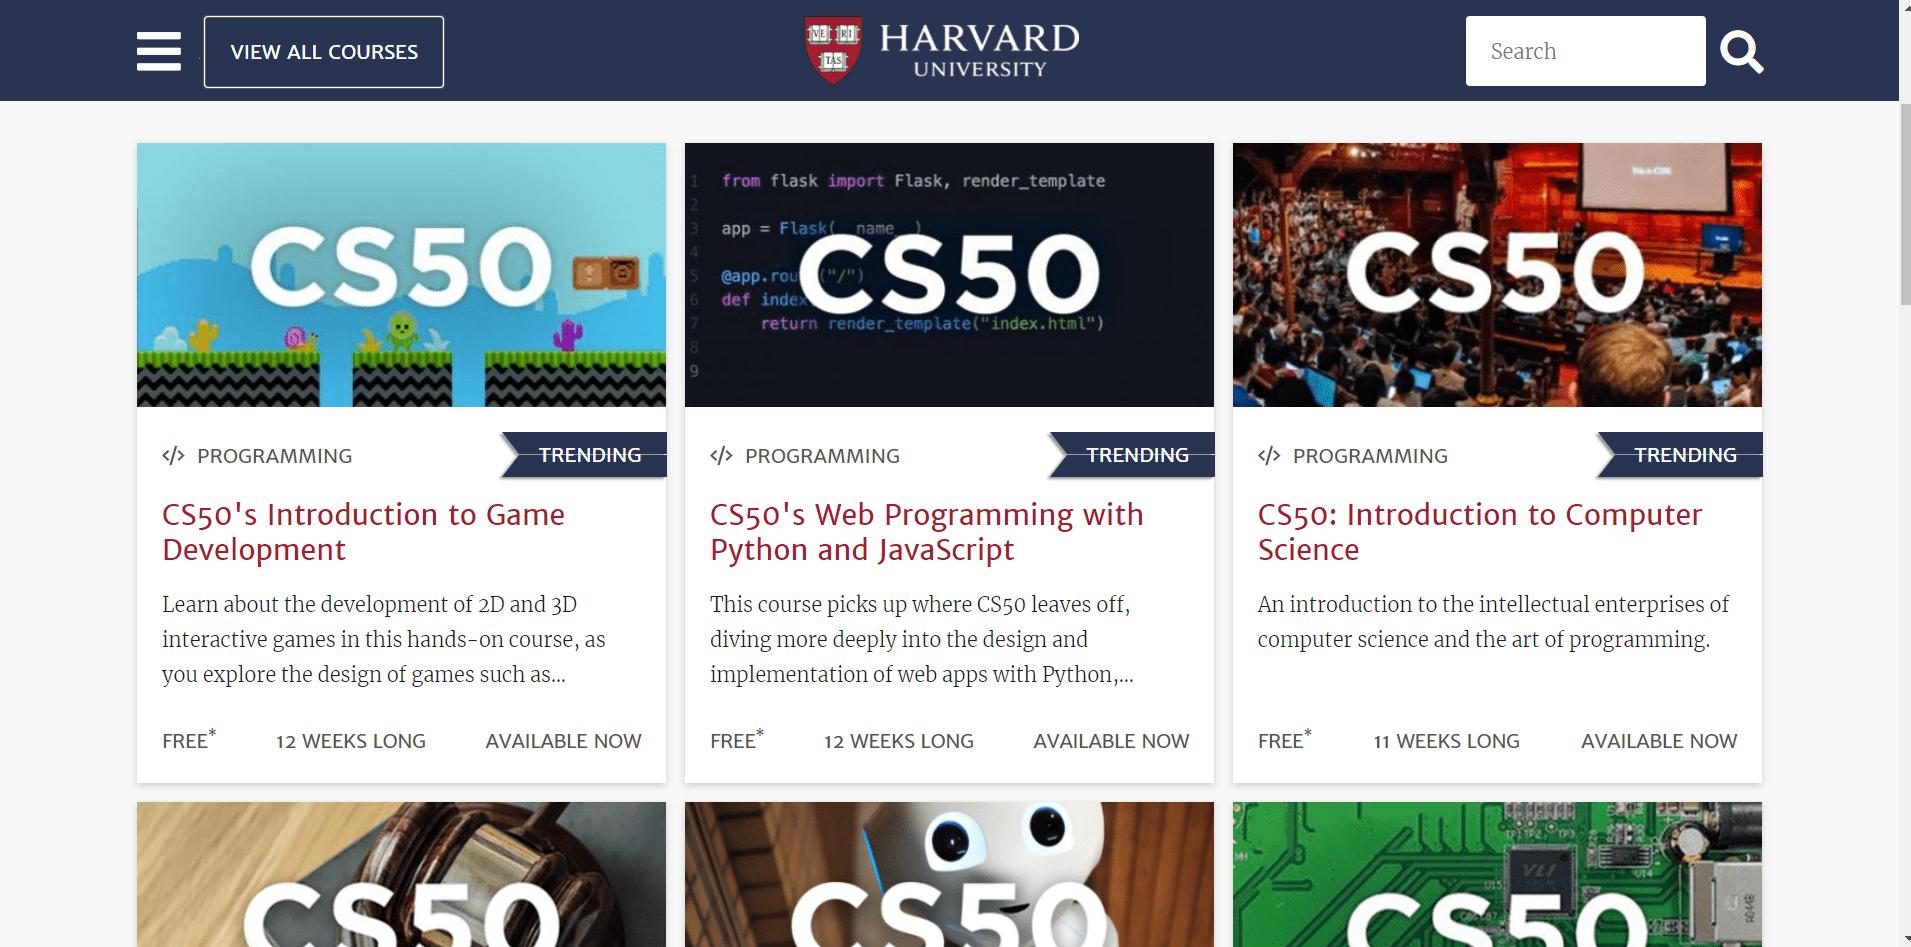 Screenshot of Harvard university's selection of free online programming courses